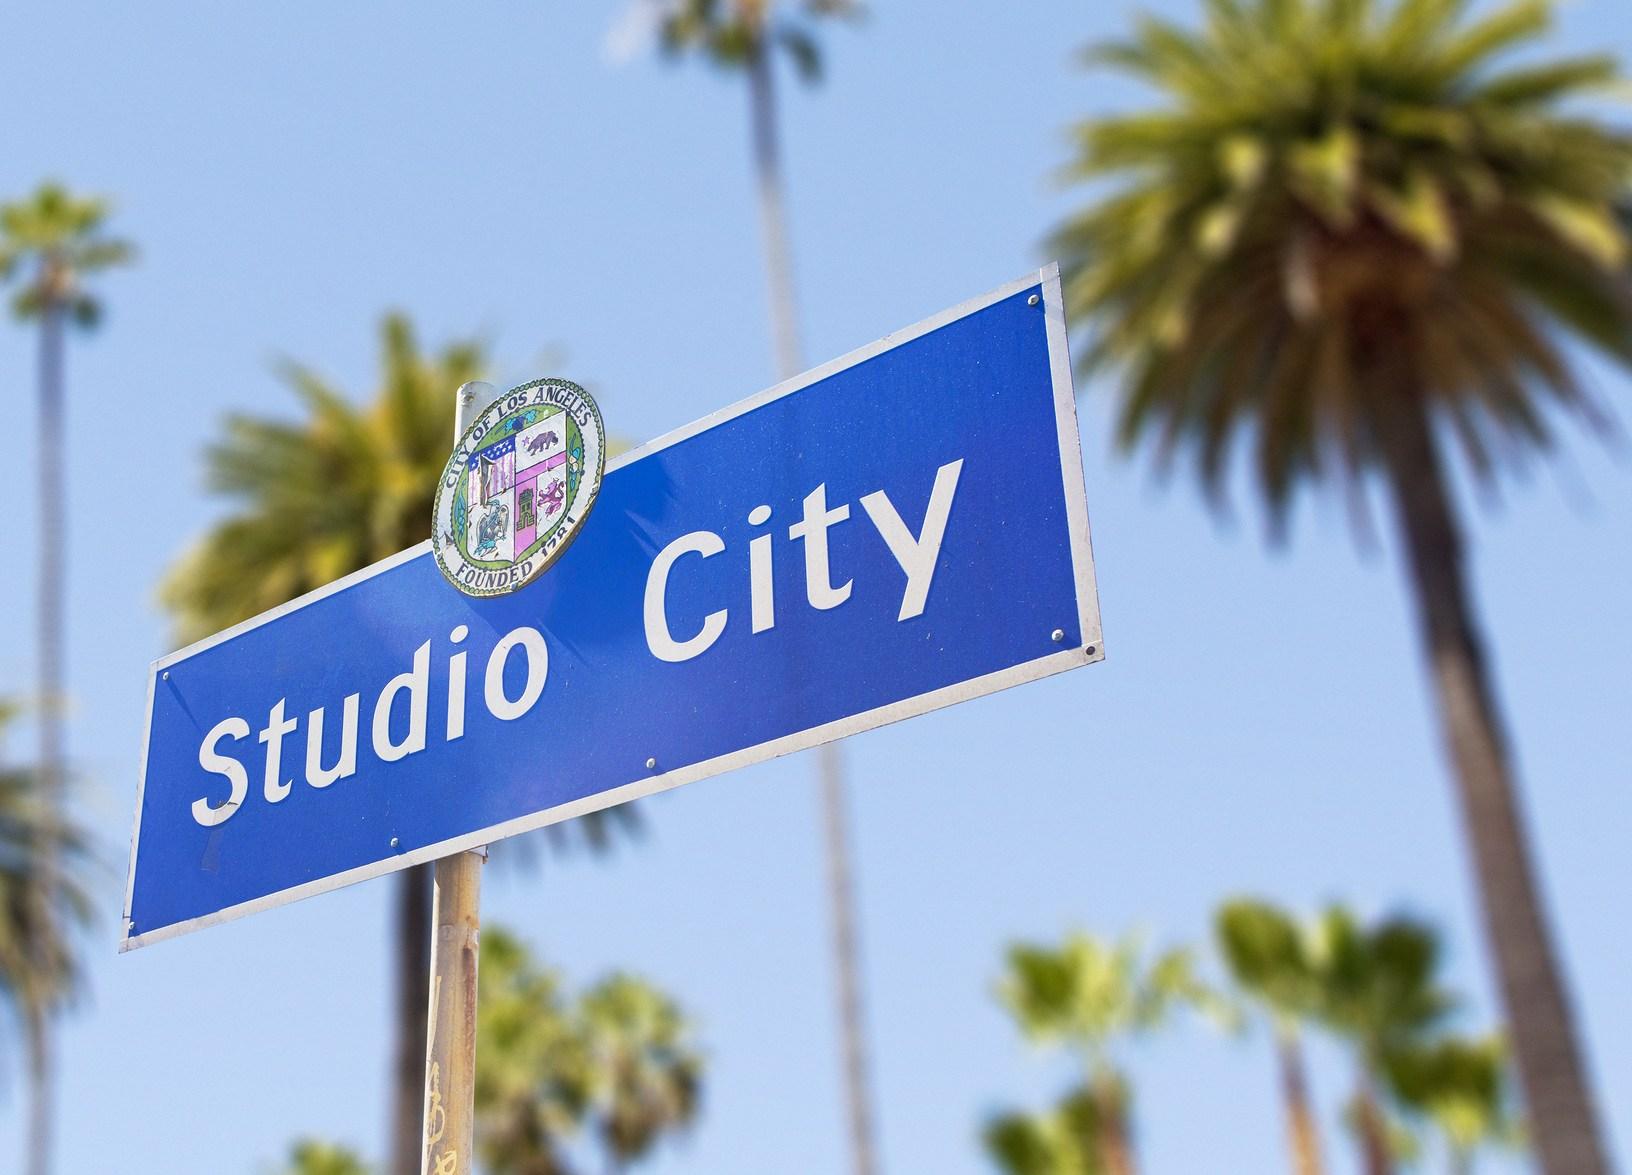 Studio City Mobile Notary Public Services